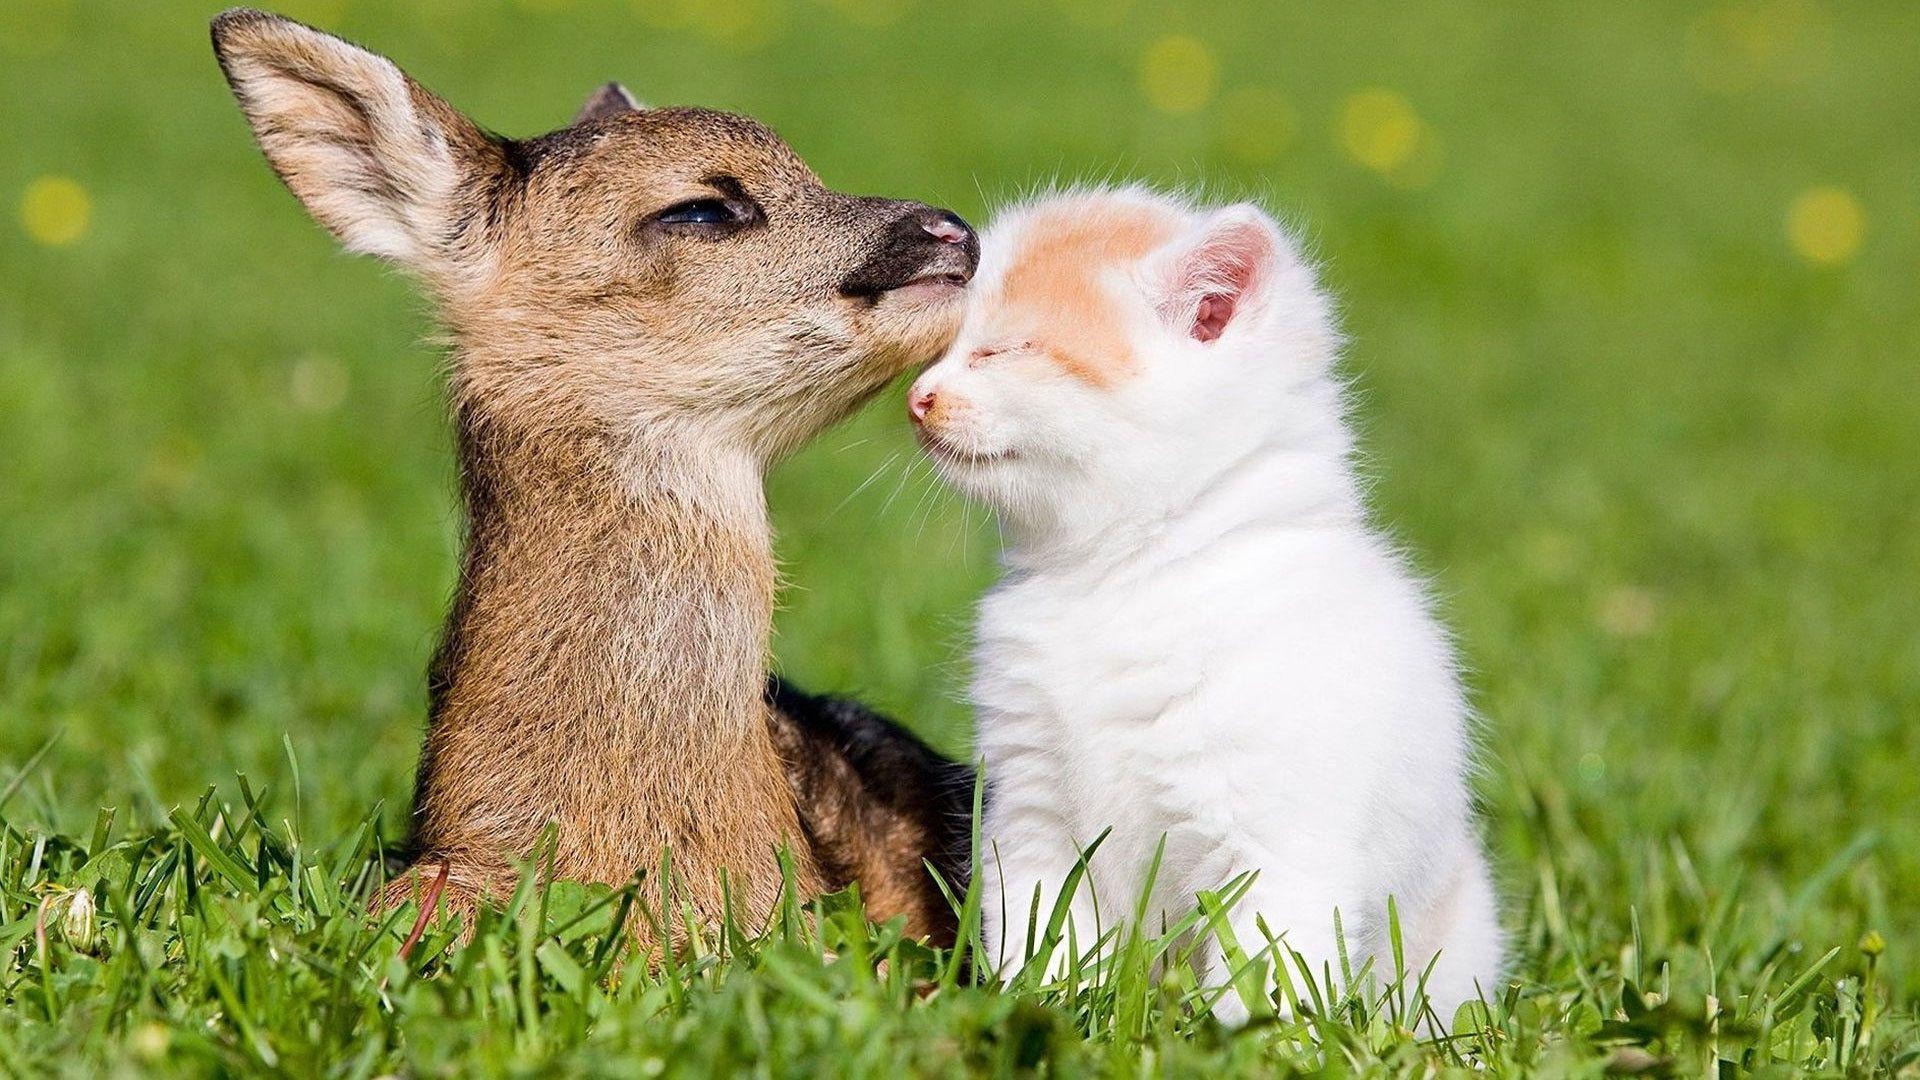 Baby Deer Vs Kitten Imgur Animals Friendship Animals Beautiful Animals Friends